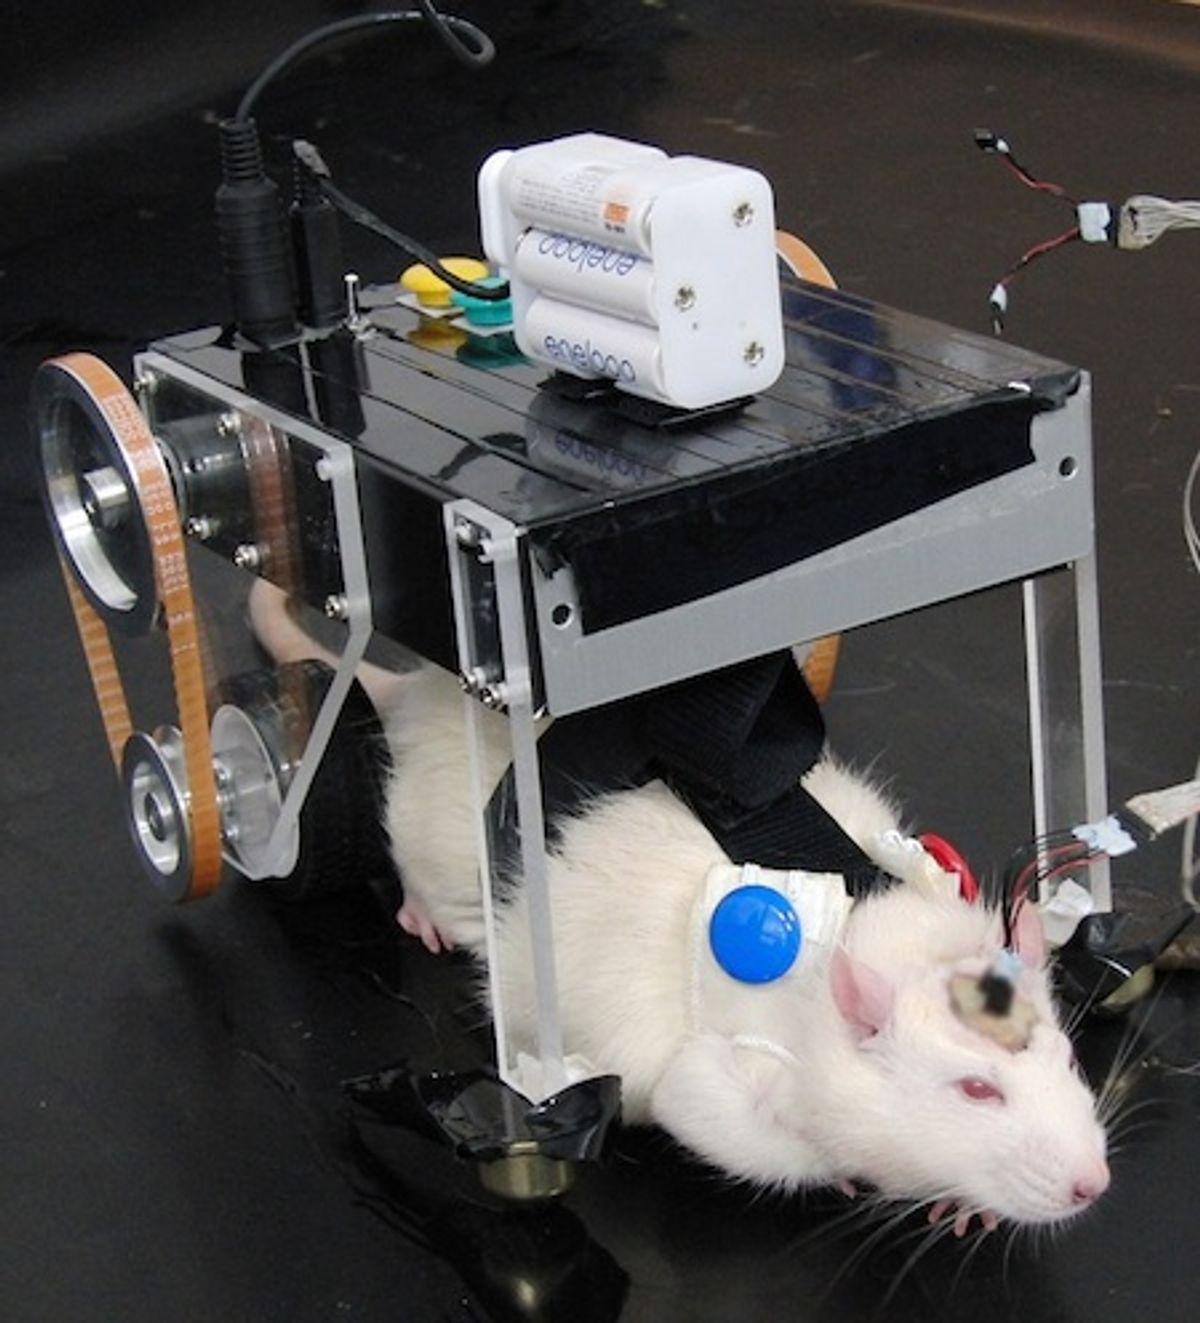 Researchers Using Rat-Robot Hybrid to Design Better Brain Machine Interfaces